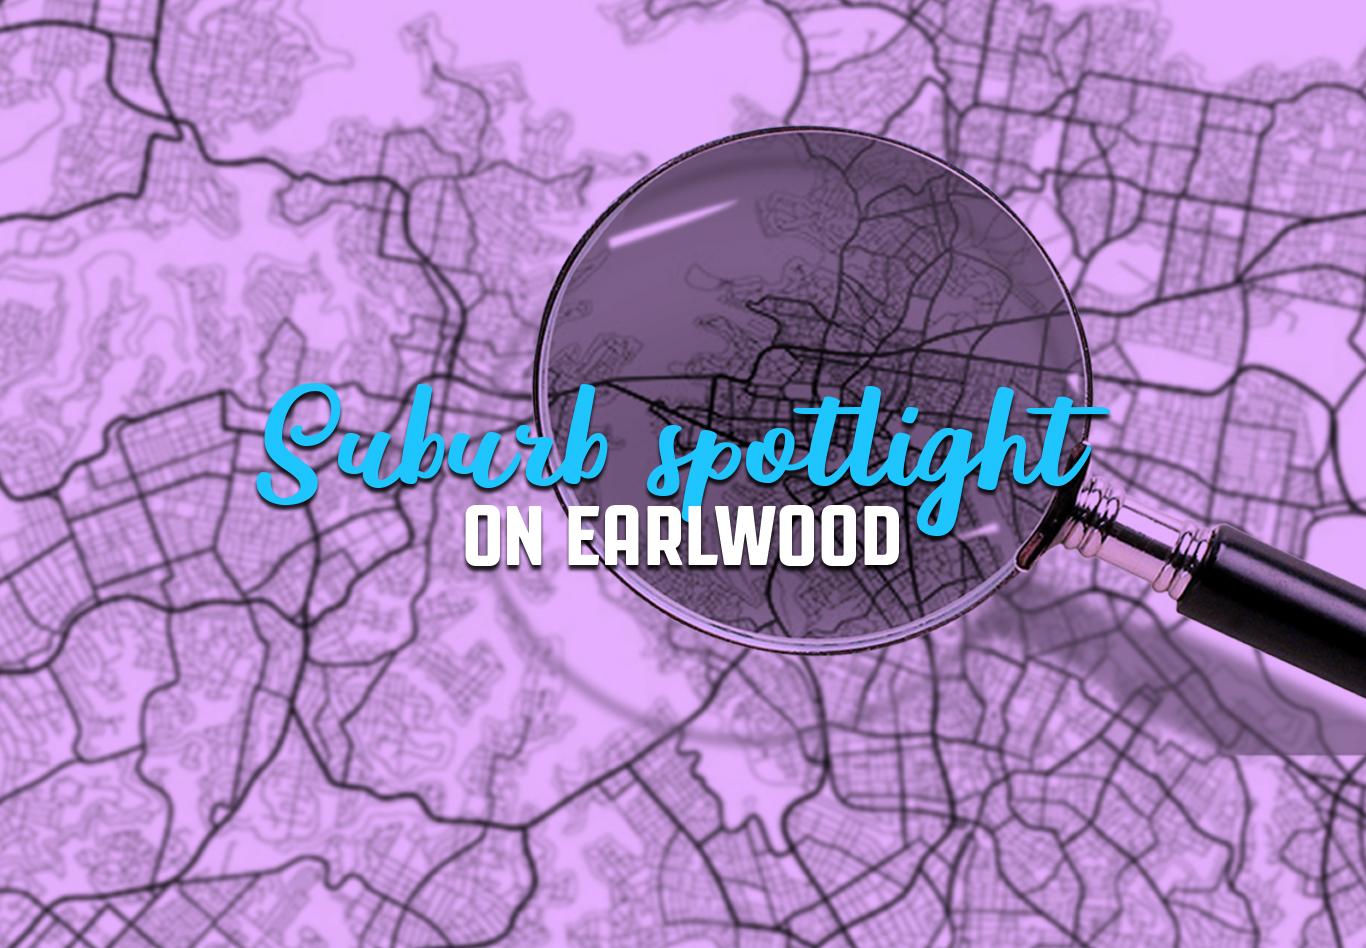 Podcast Suburb Spotlight on Earlwood